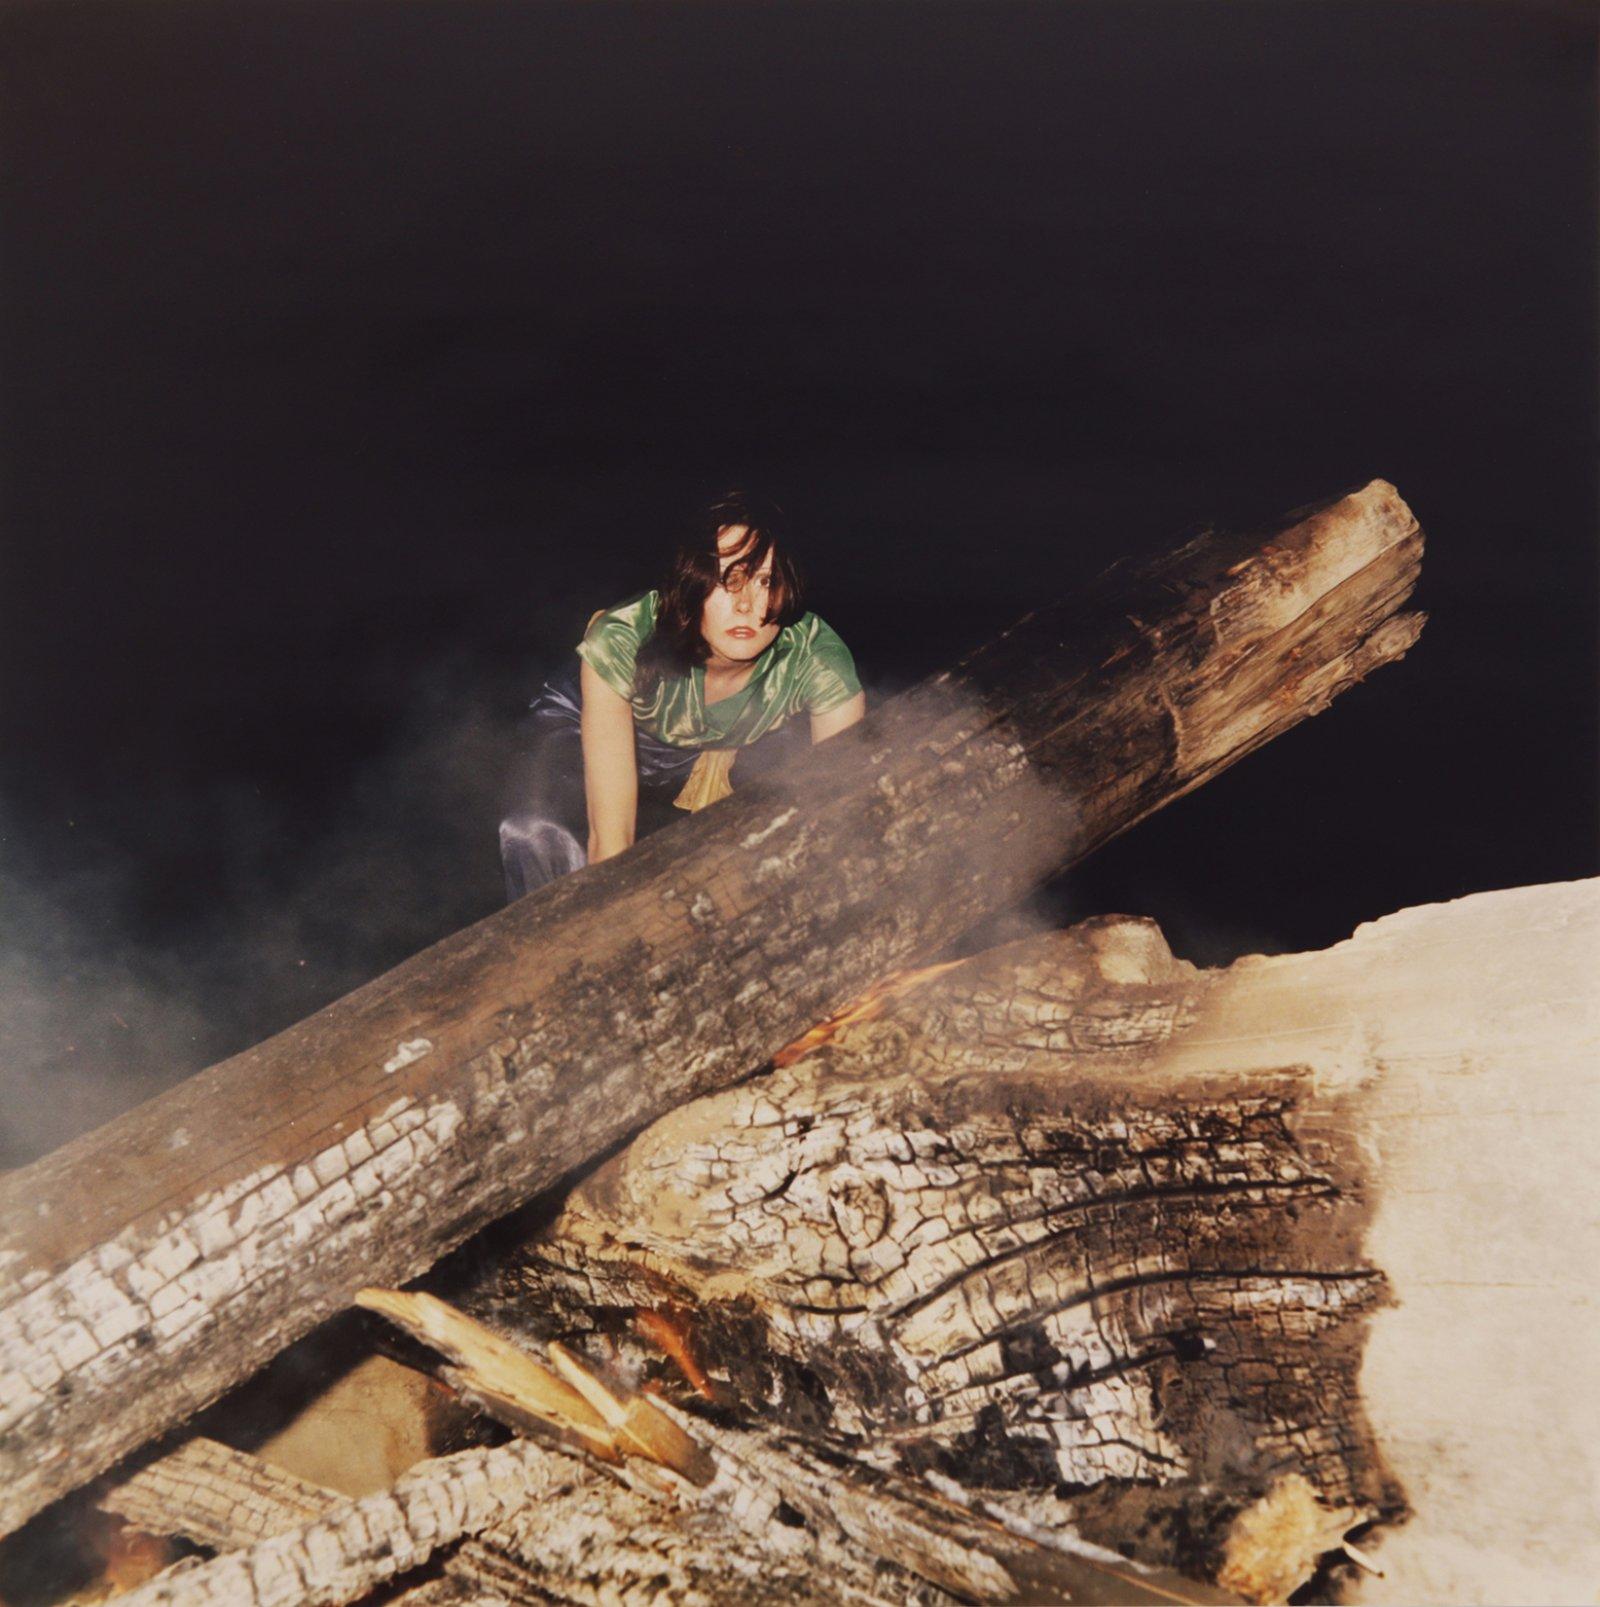 Ian Wallace, Hypnerotomachia (the Fire) (detail), 1977, 4 c-prints, 29 x 116 in. (74 x 295 cm)